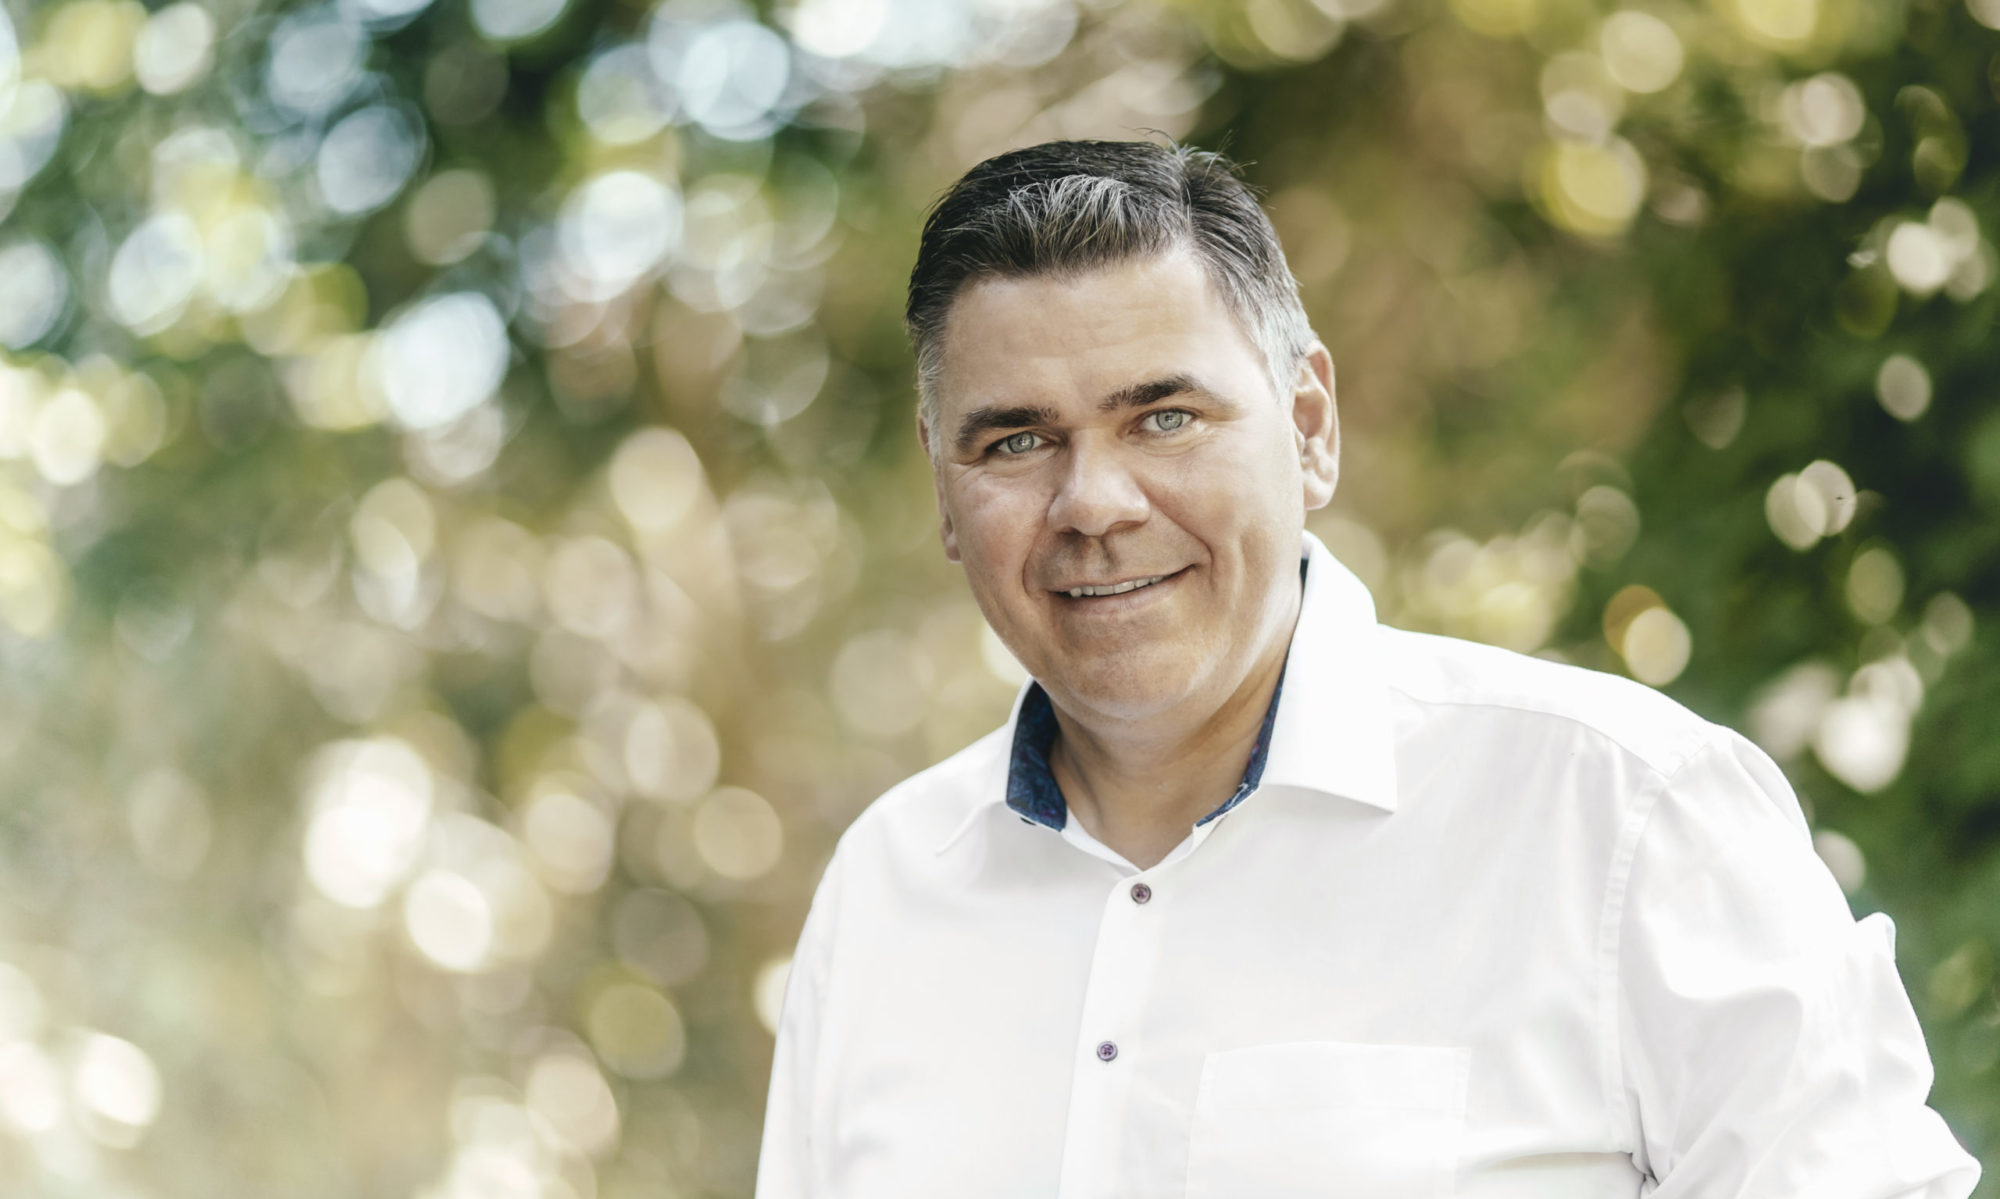 Mario Löhr